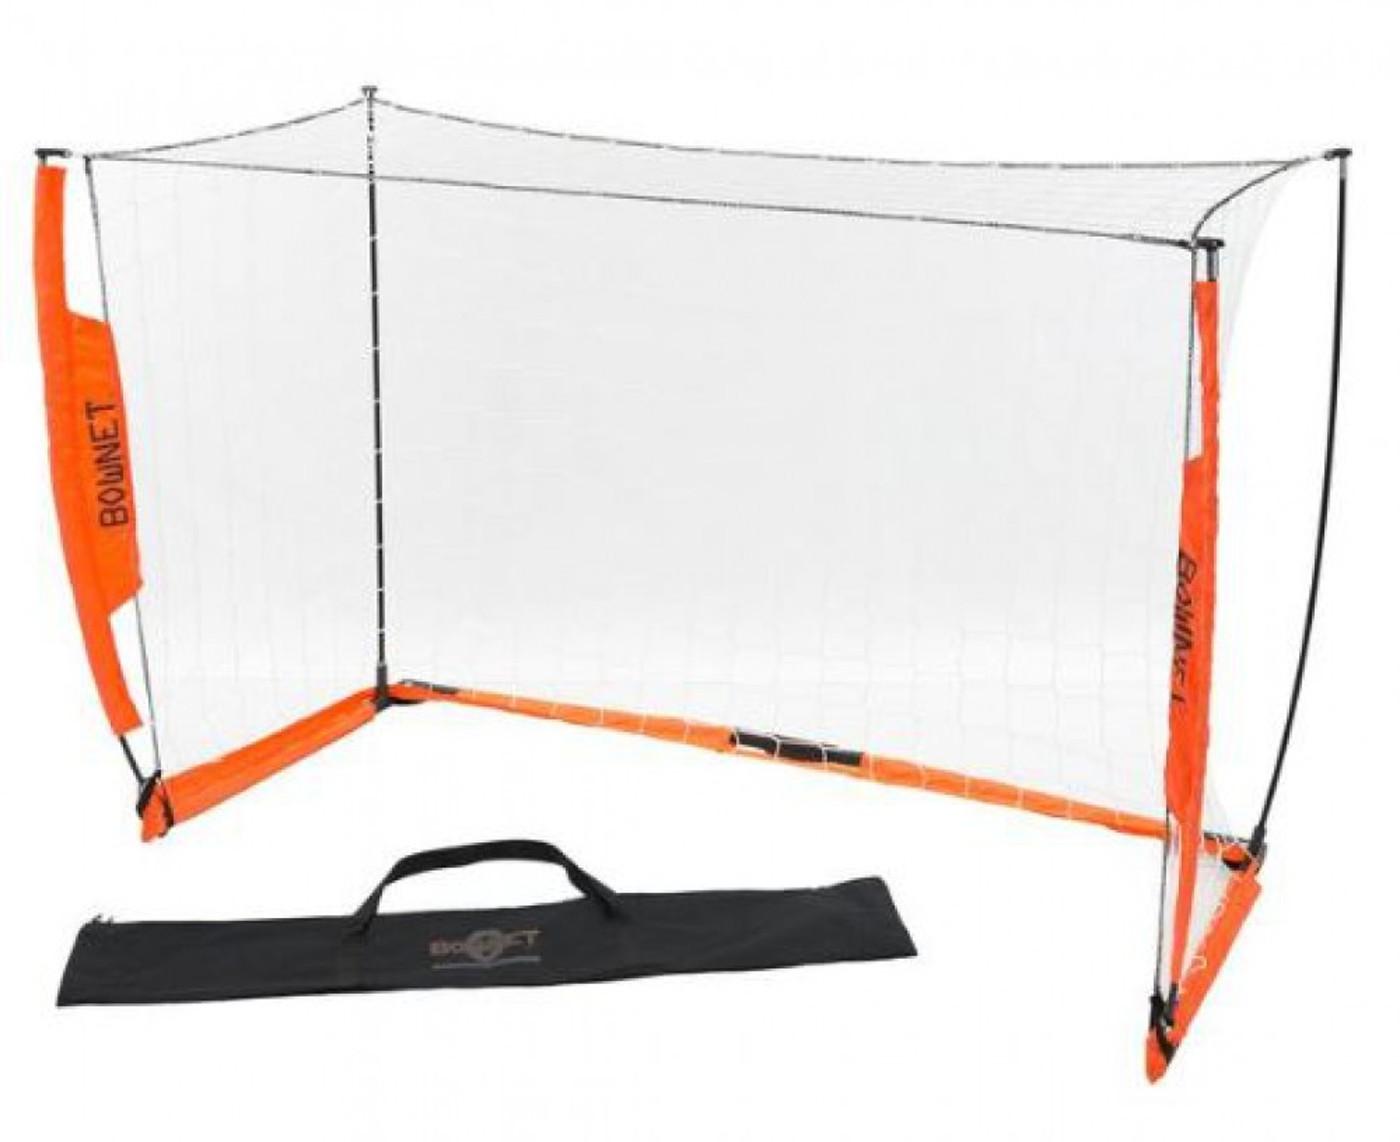 BOWNET Fußballtor 1.8 x 1.2 m